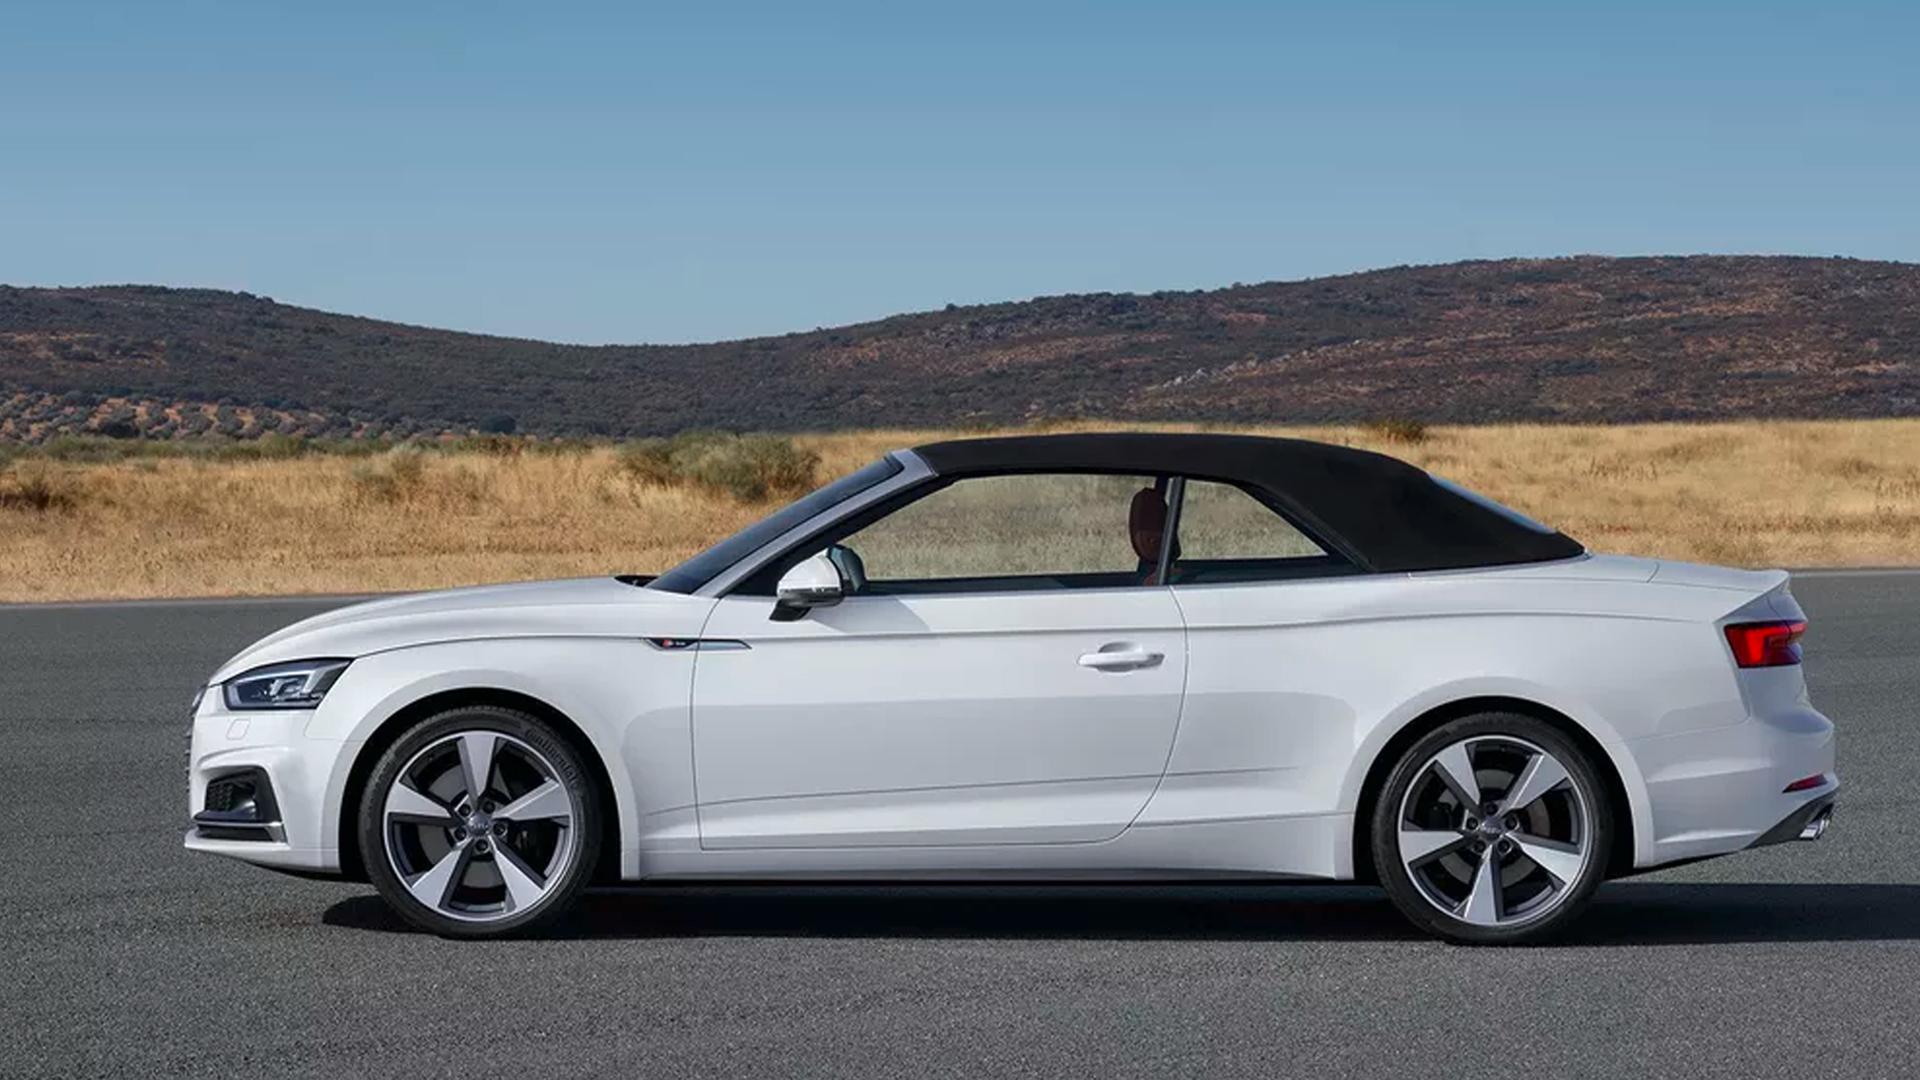 Audi A5 Cabriolet 2017 STD Exterior